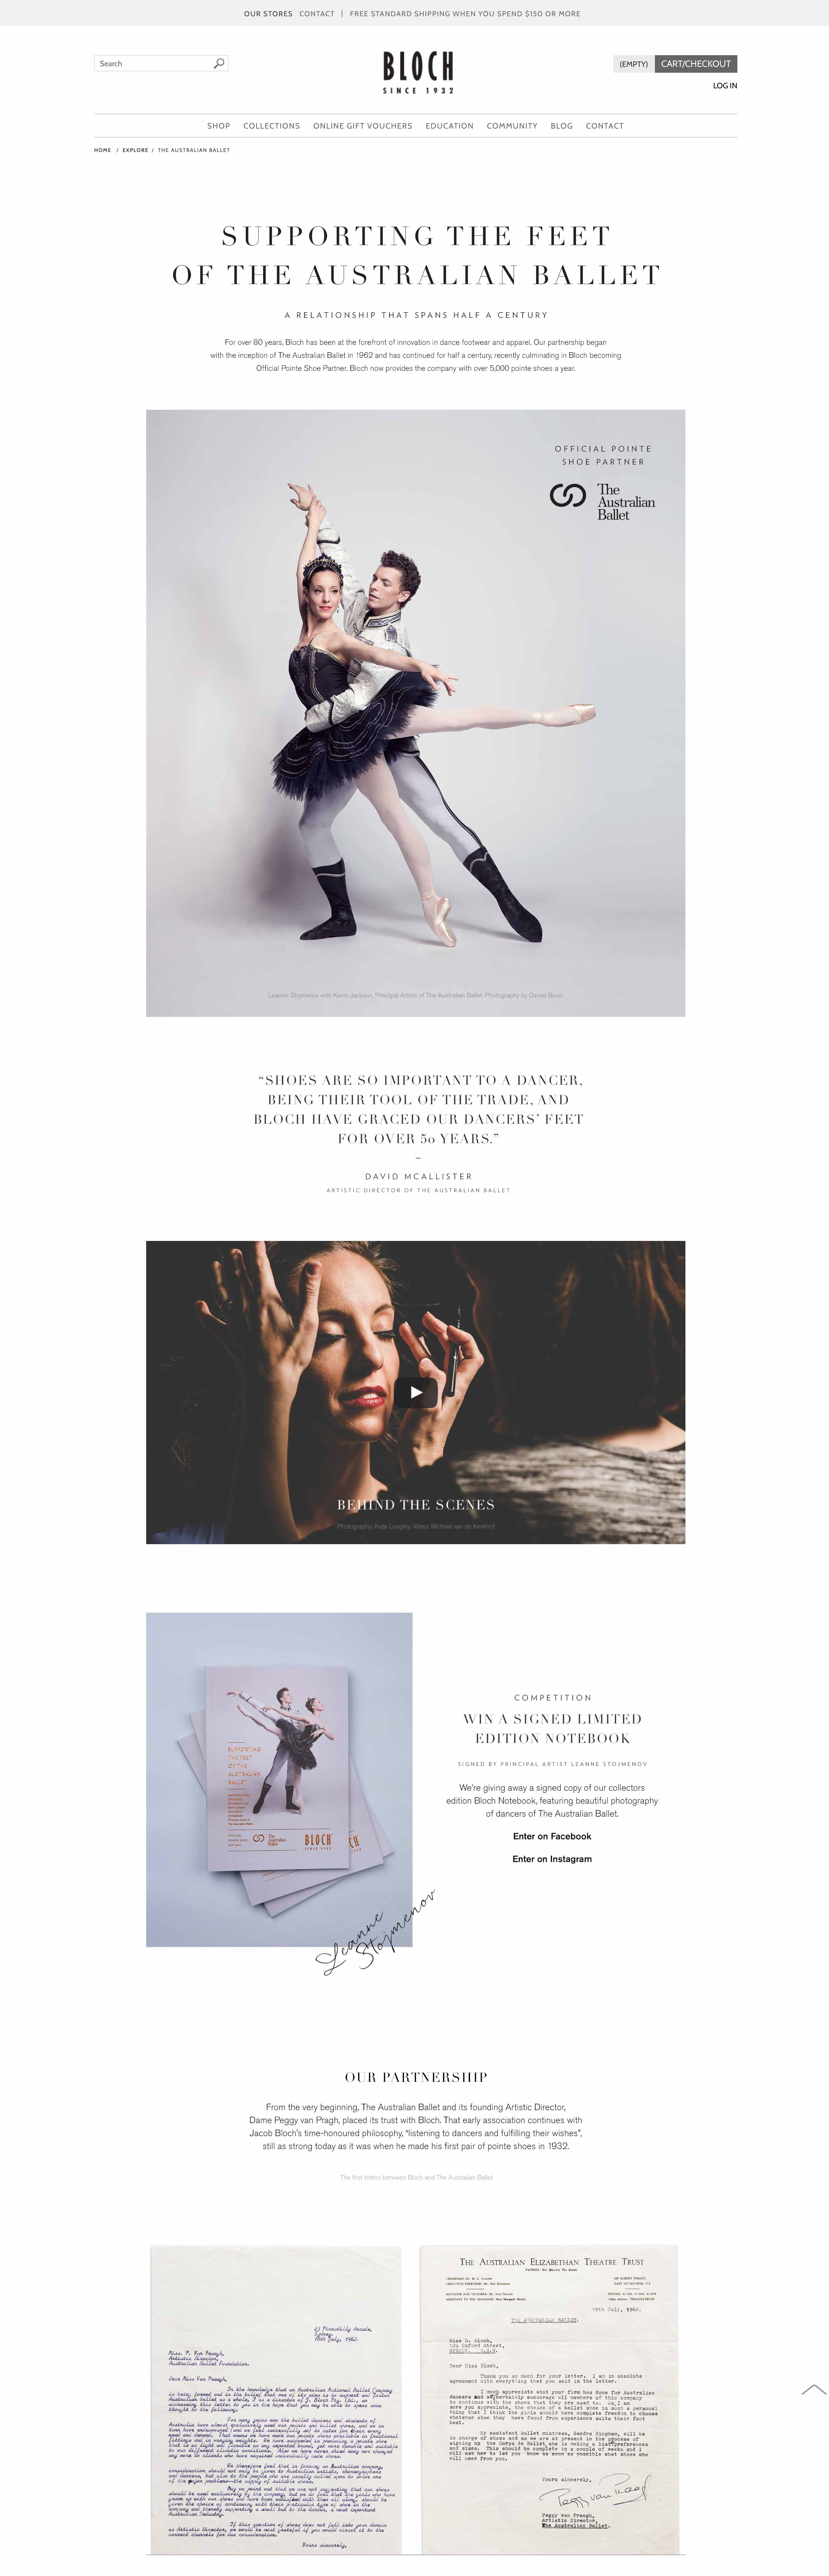 The Australian Ballet Landing Page